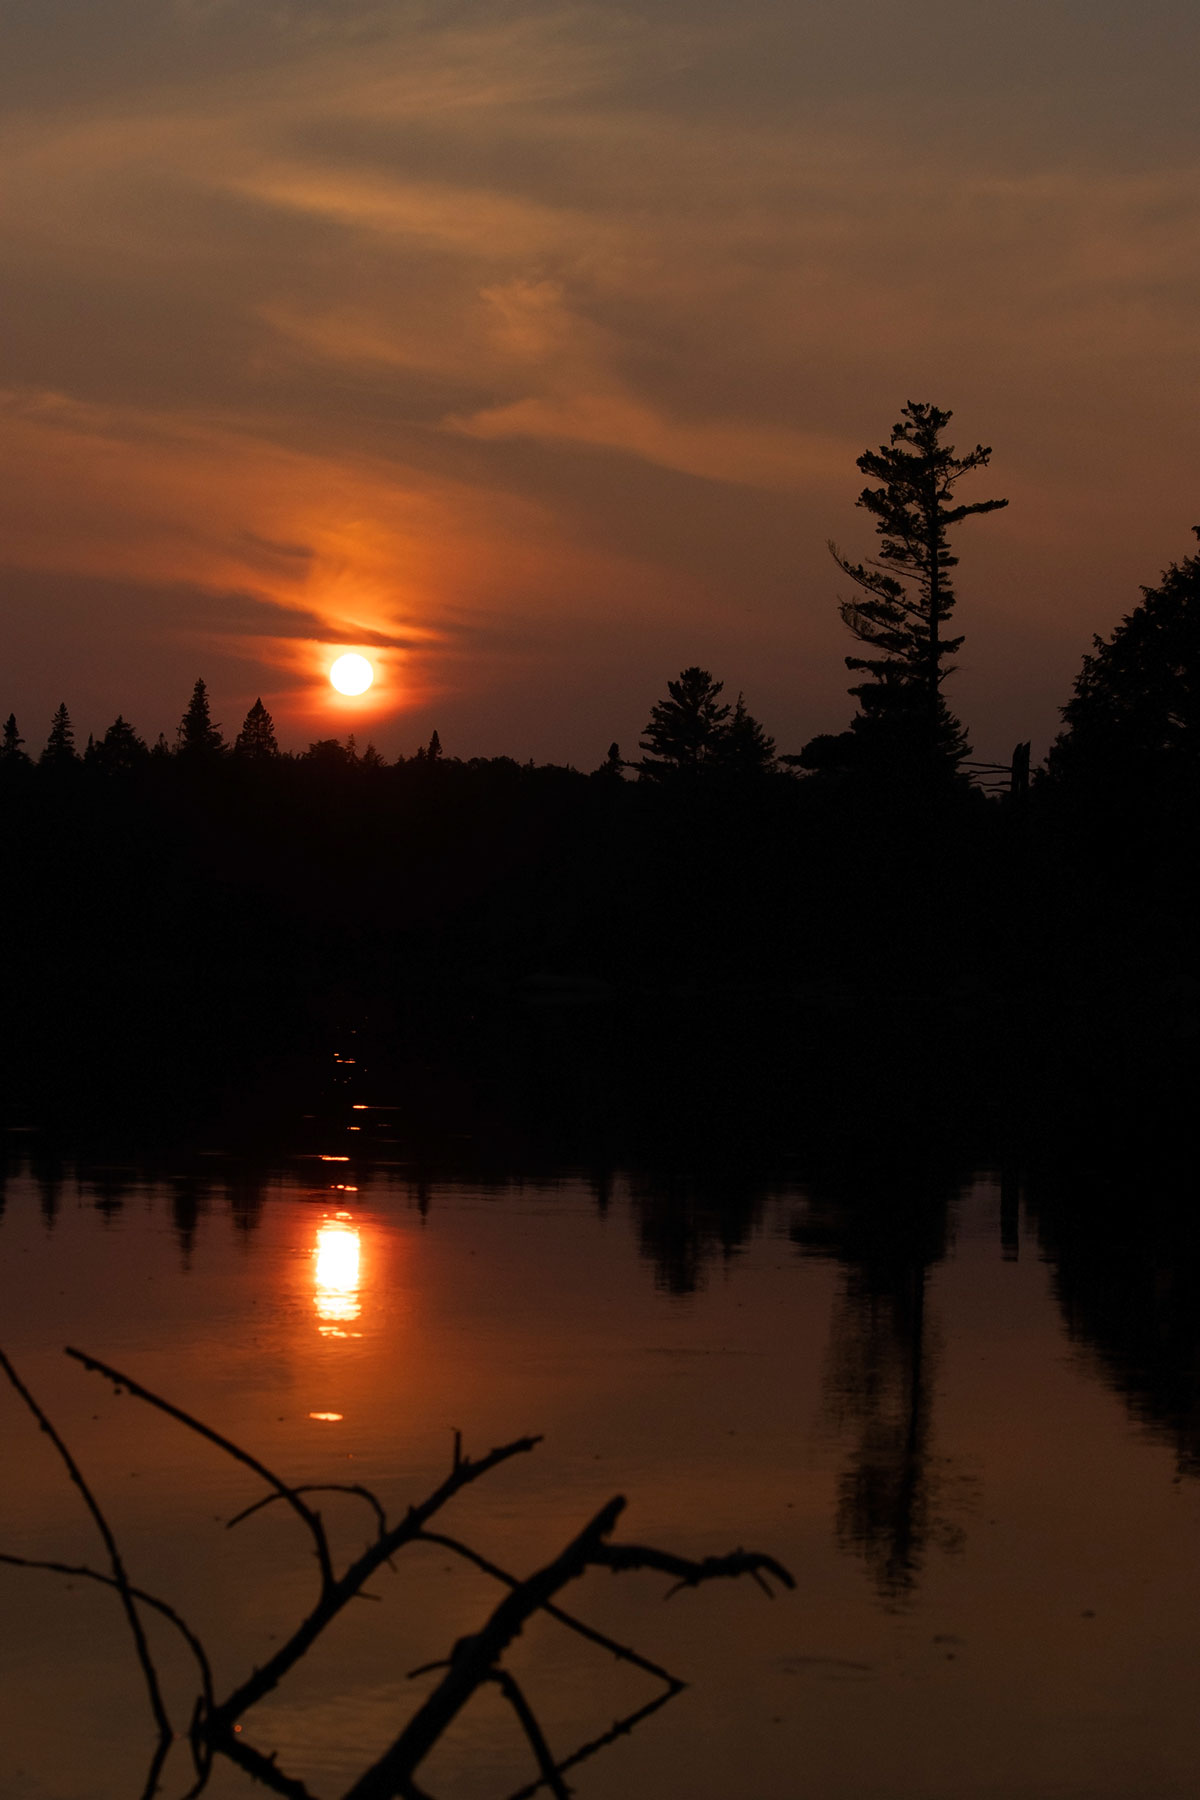 Sunset on Queer Lake campsite July 2021 Algonquin Park - 8